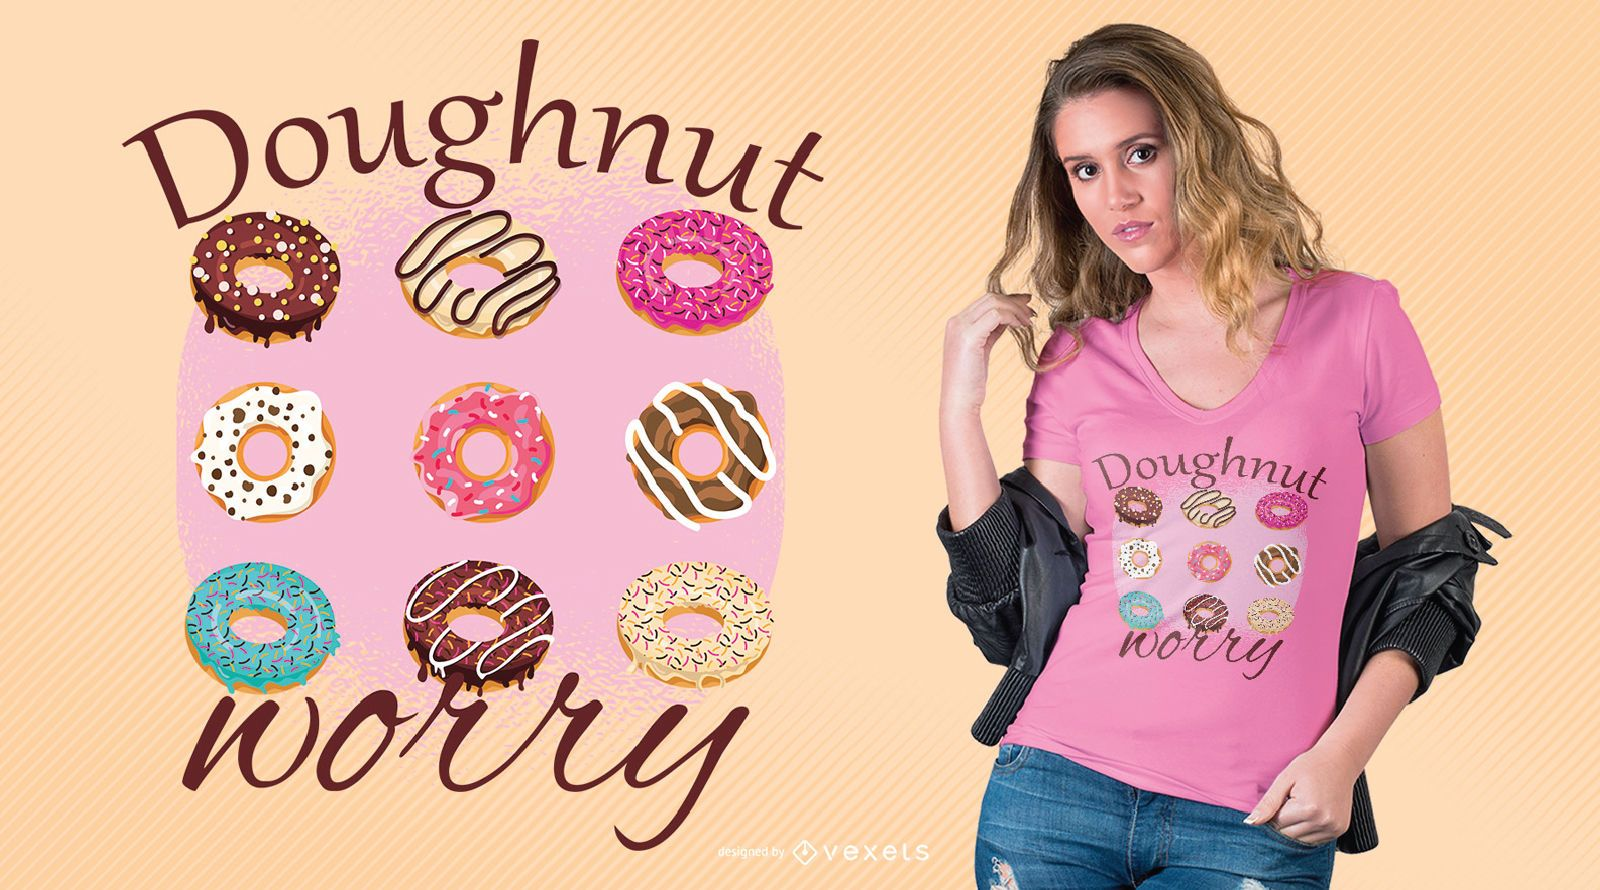 Doughnut worry t-shirt design